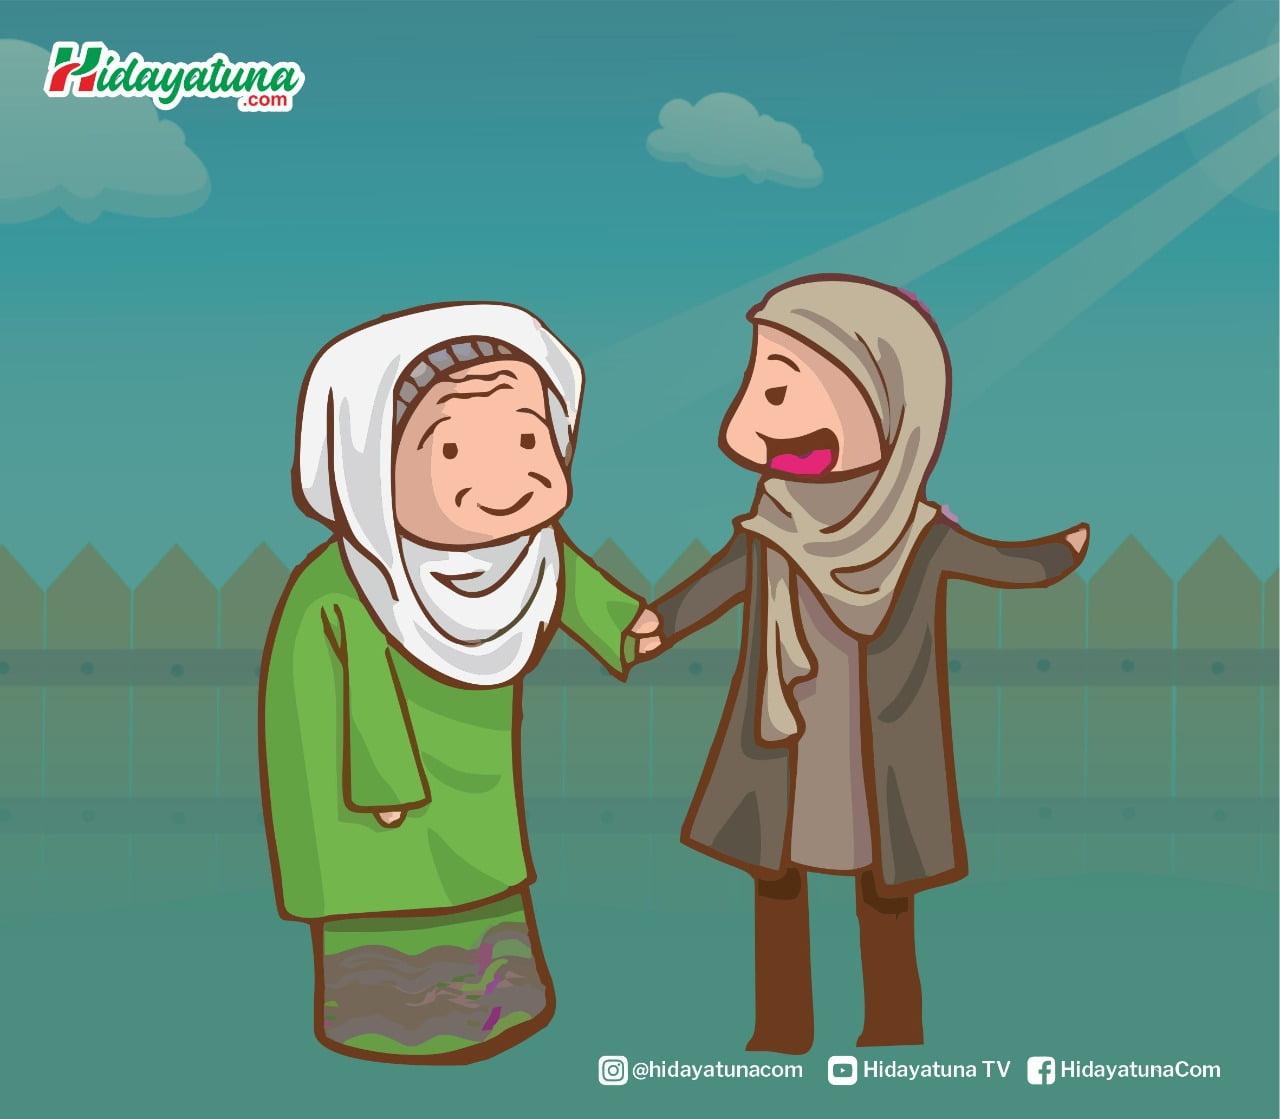 Menjadi manusia yang terbaik dengan menebar manfaat pada orang lain (Ilustrasi/Hidayatuna)